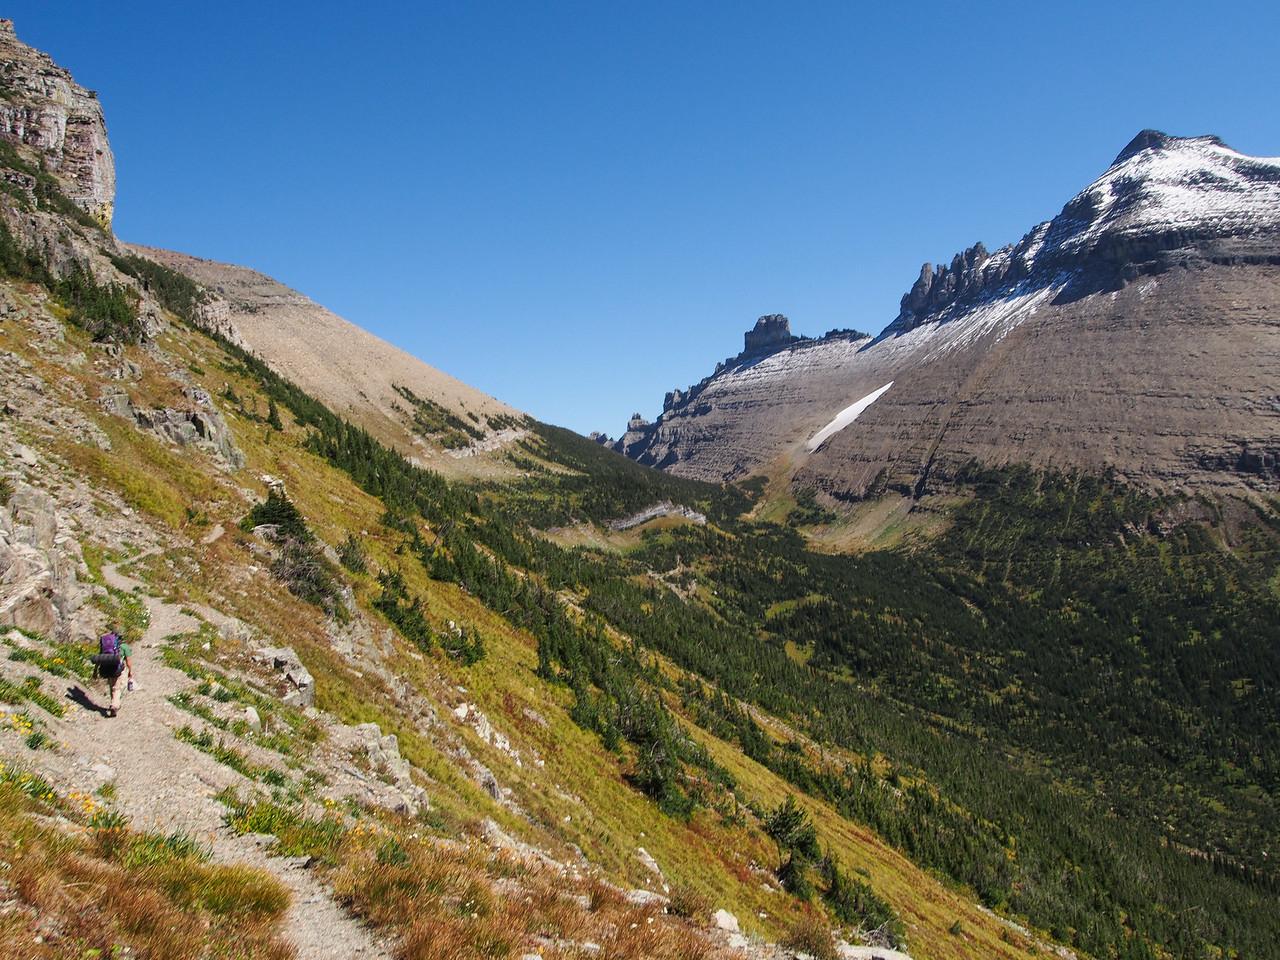 Day 4/5 - Iceberg Peak along Highline trail, Glacier NP